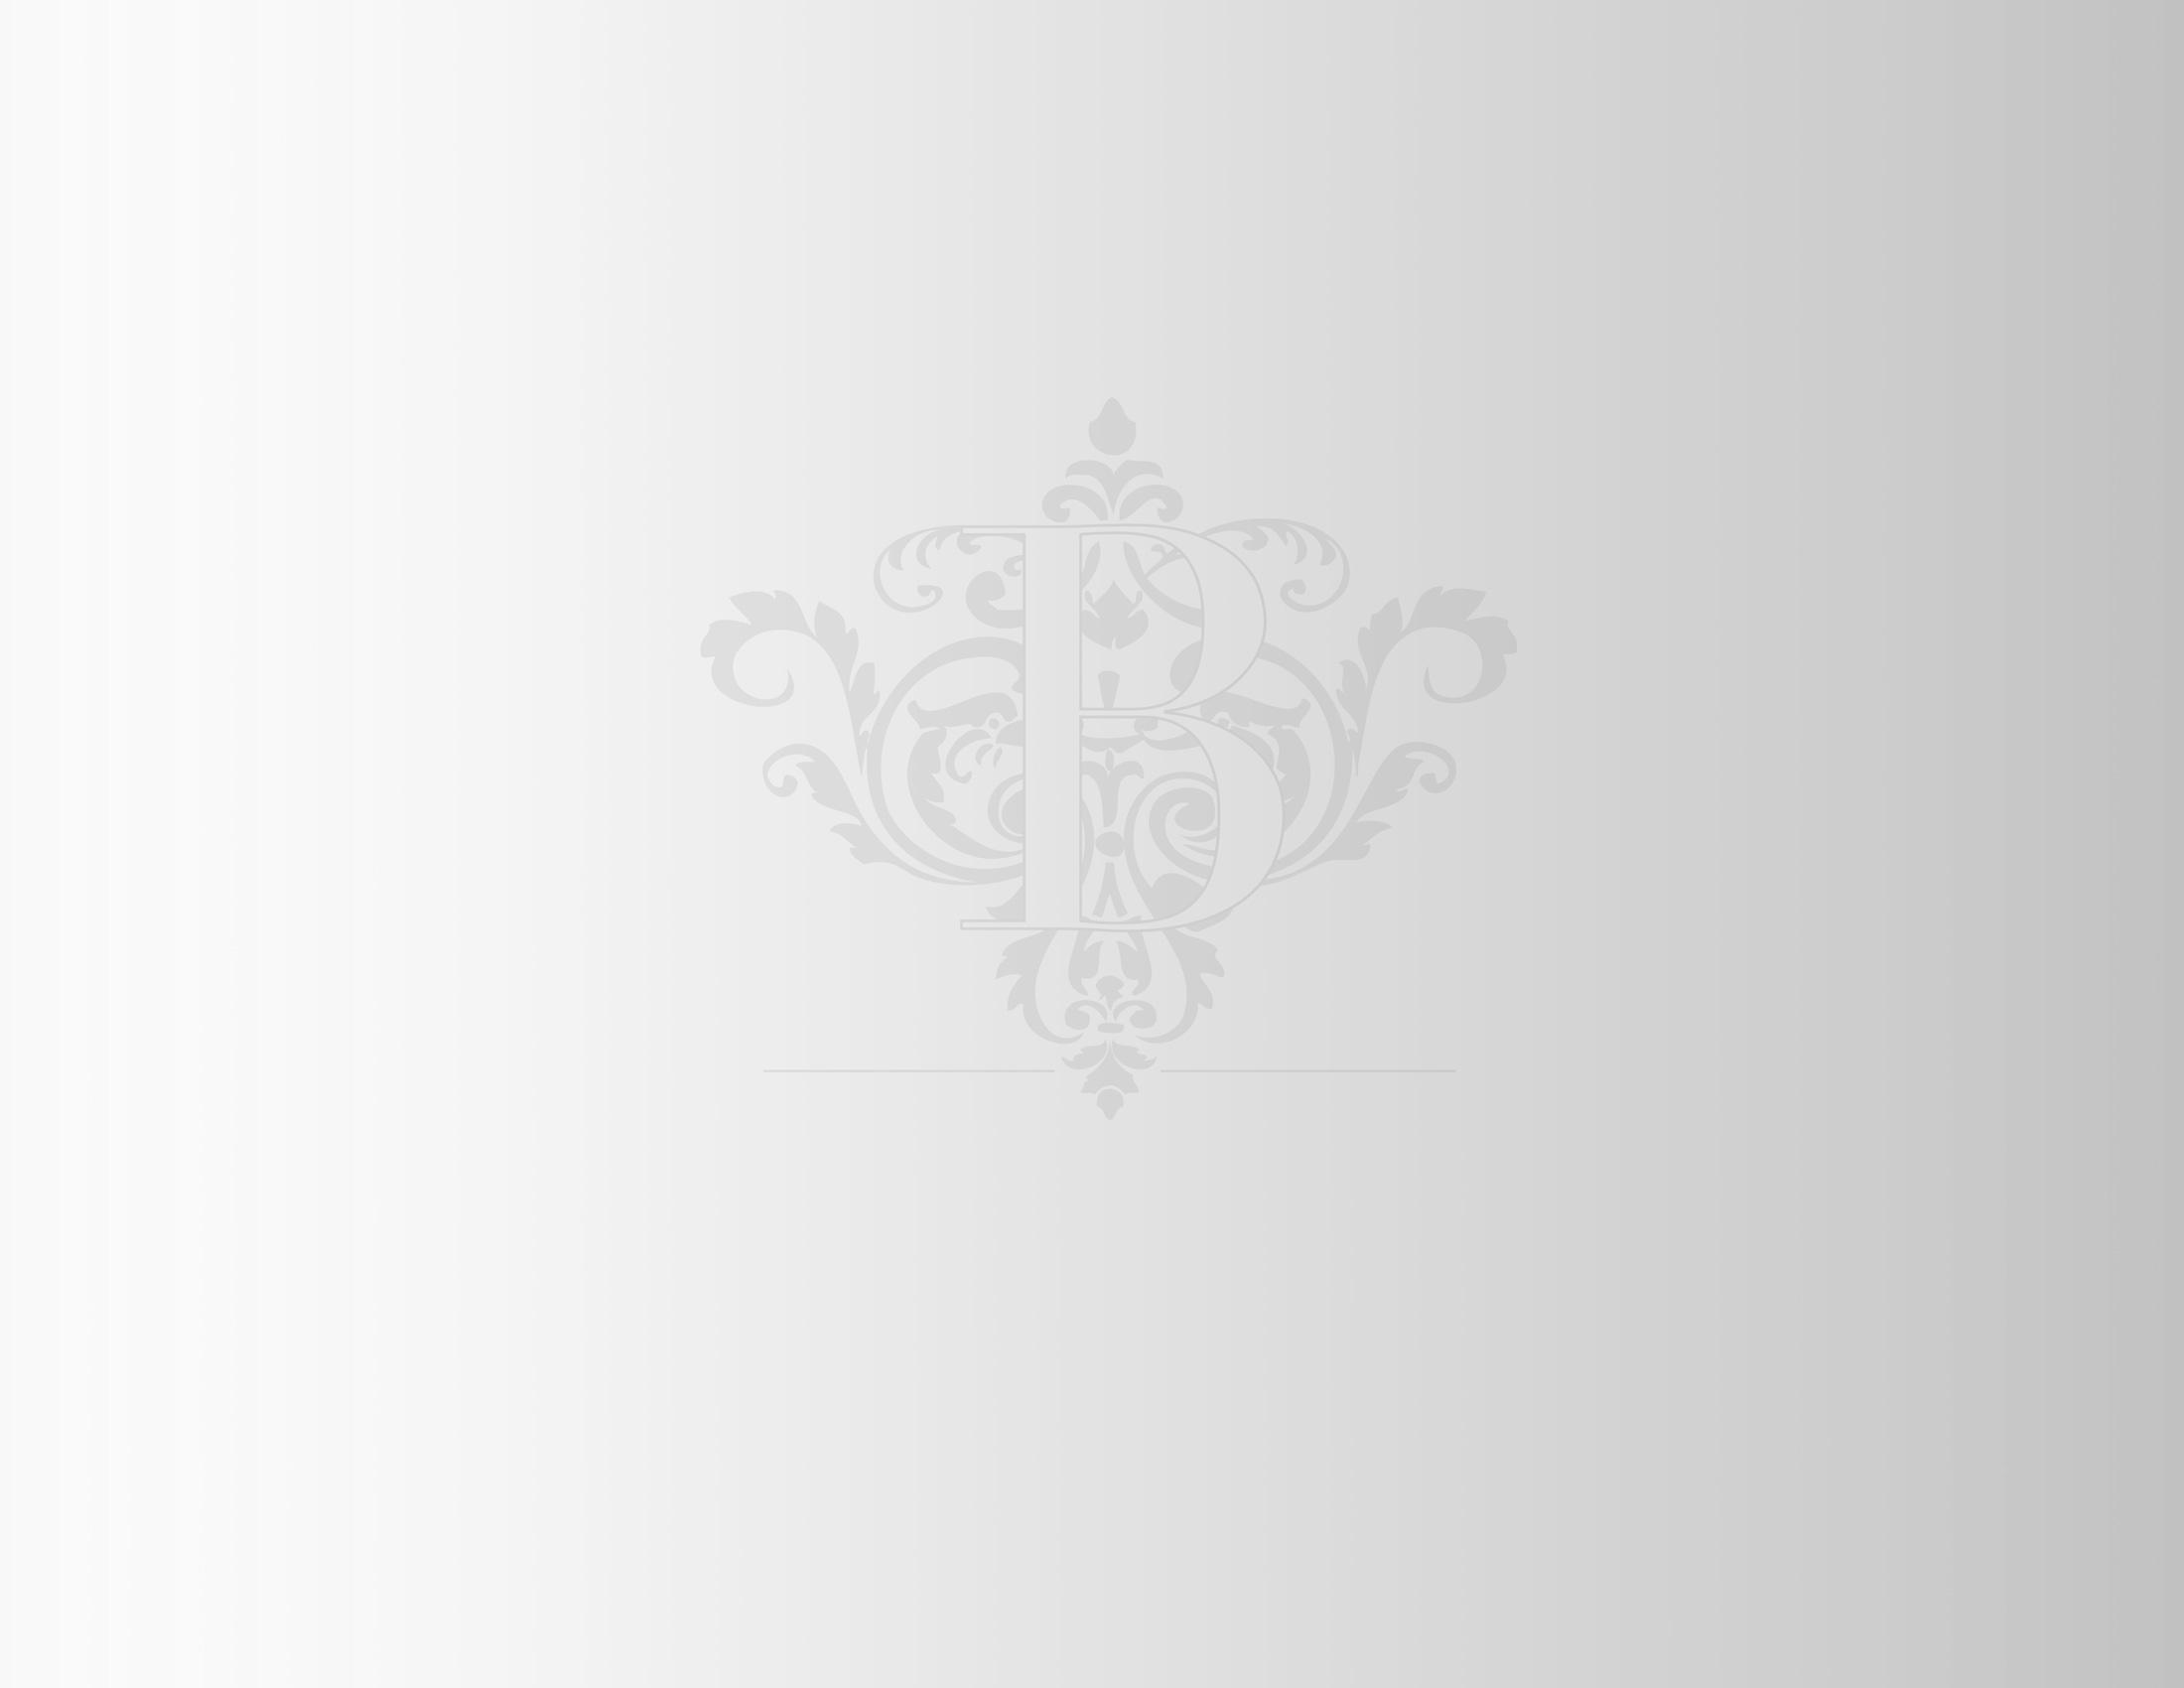 Boich Family Cellar Logo background